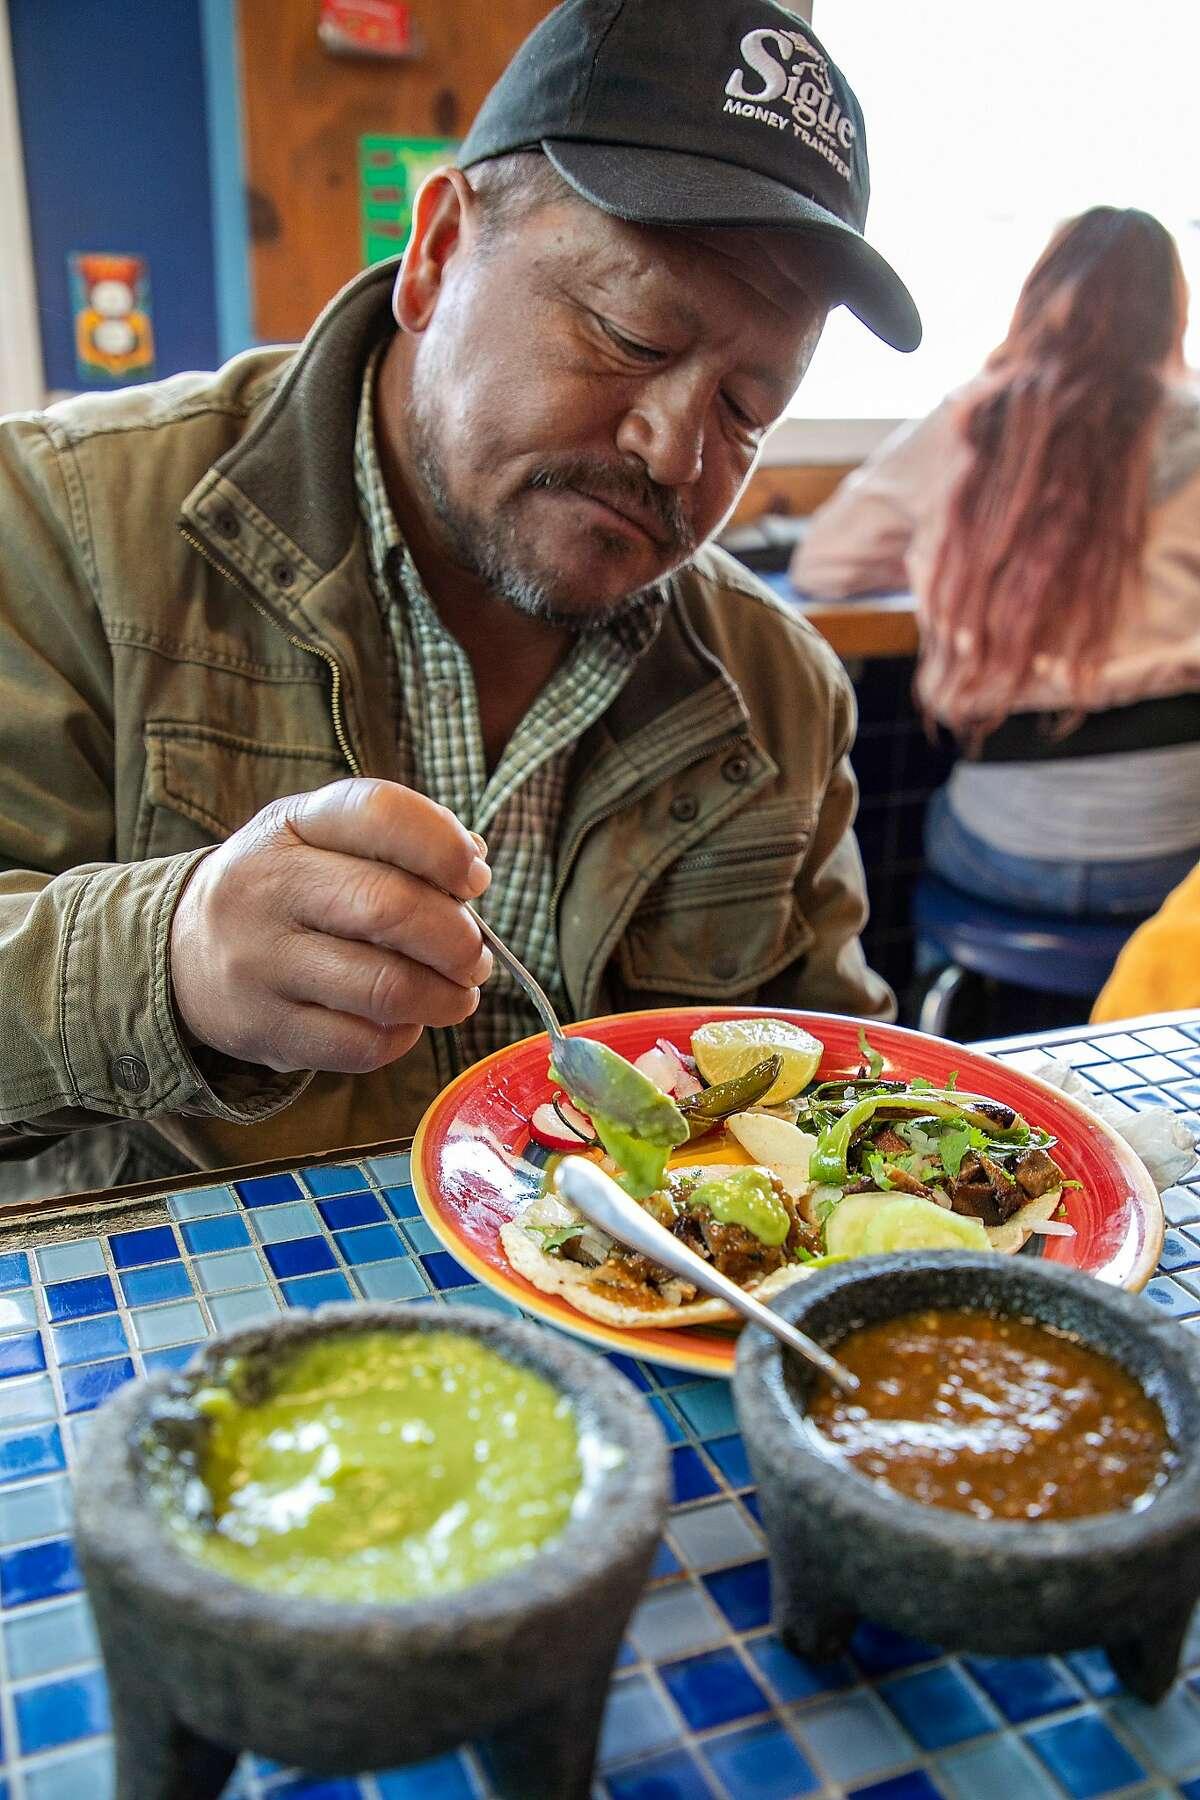 Raymundo Arias, of Salinas, eats beef tongue tacos at Eva's Cafe on Tuesday, August 20, 2019 in Salinas, Calif.